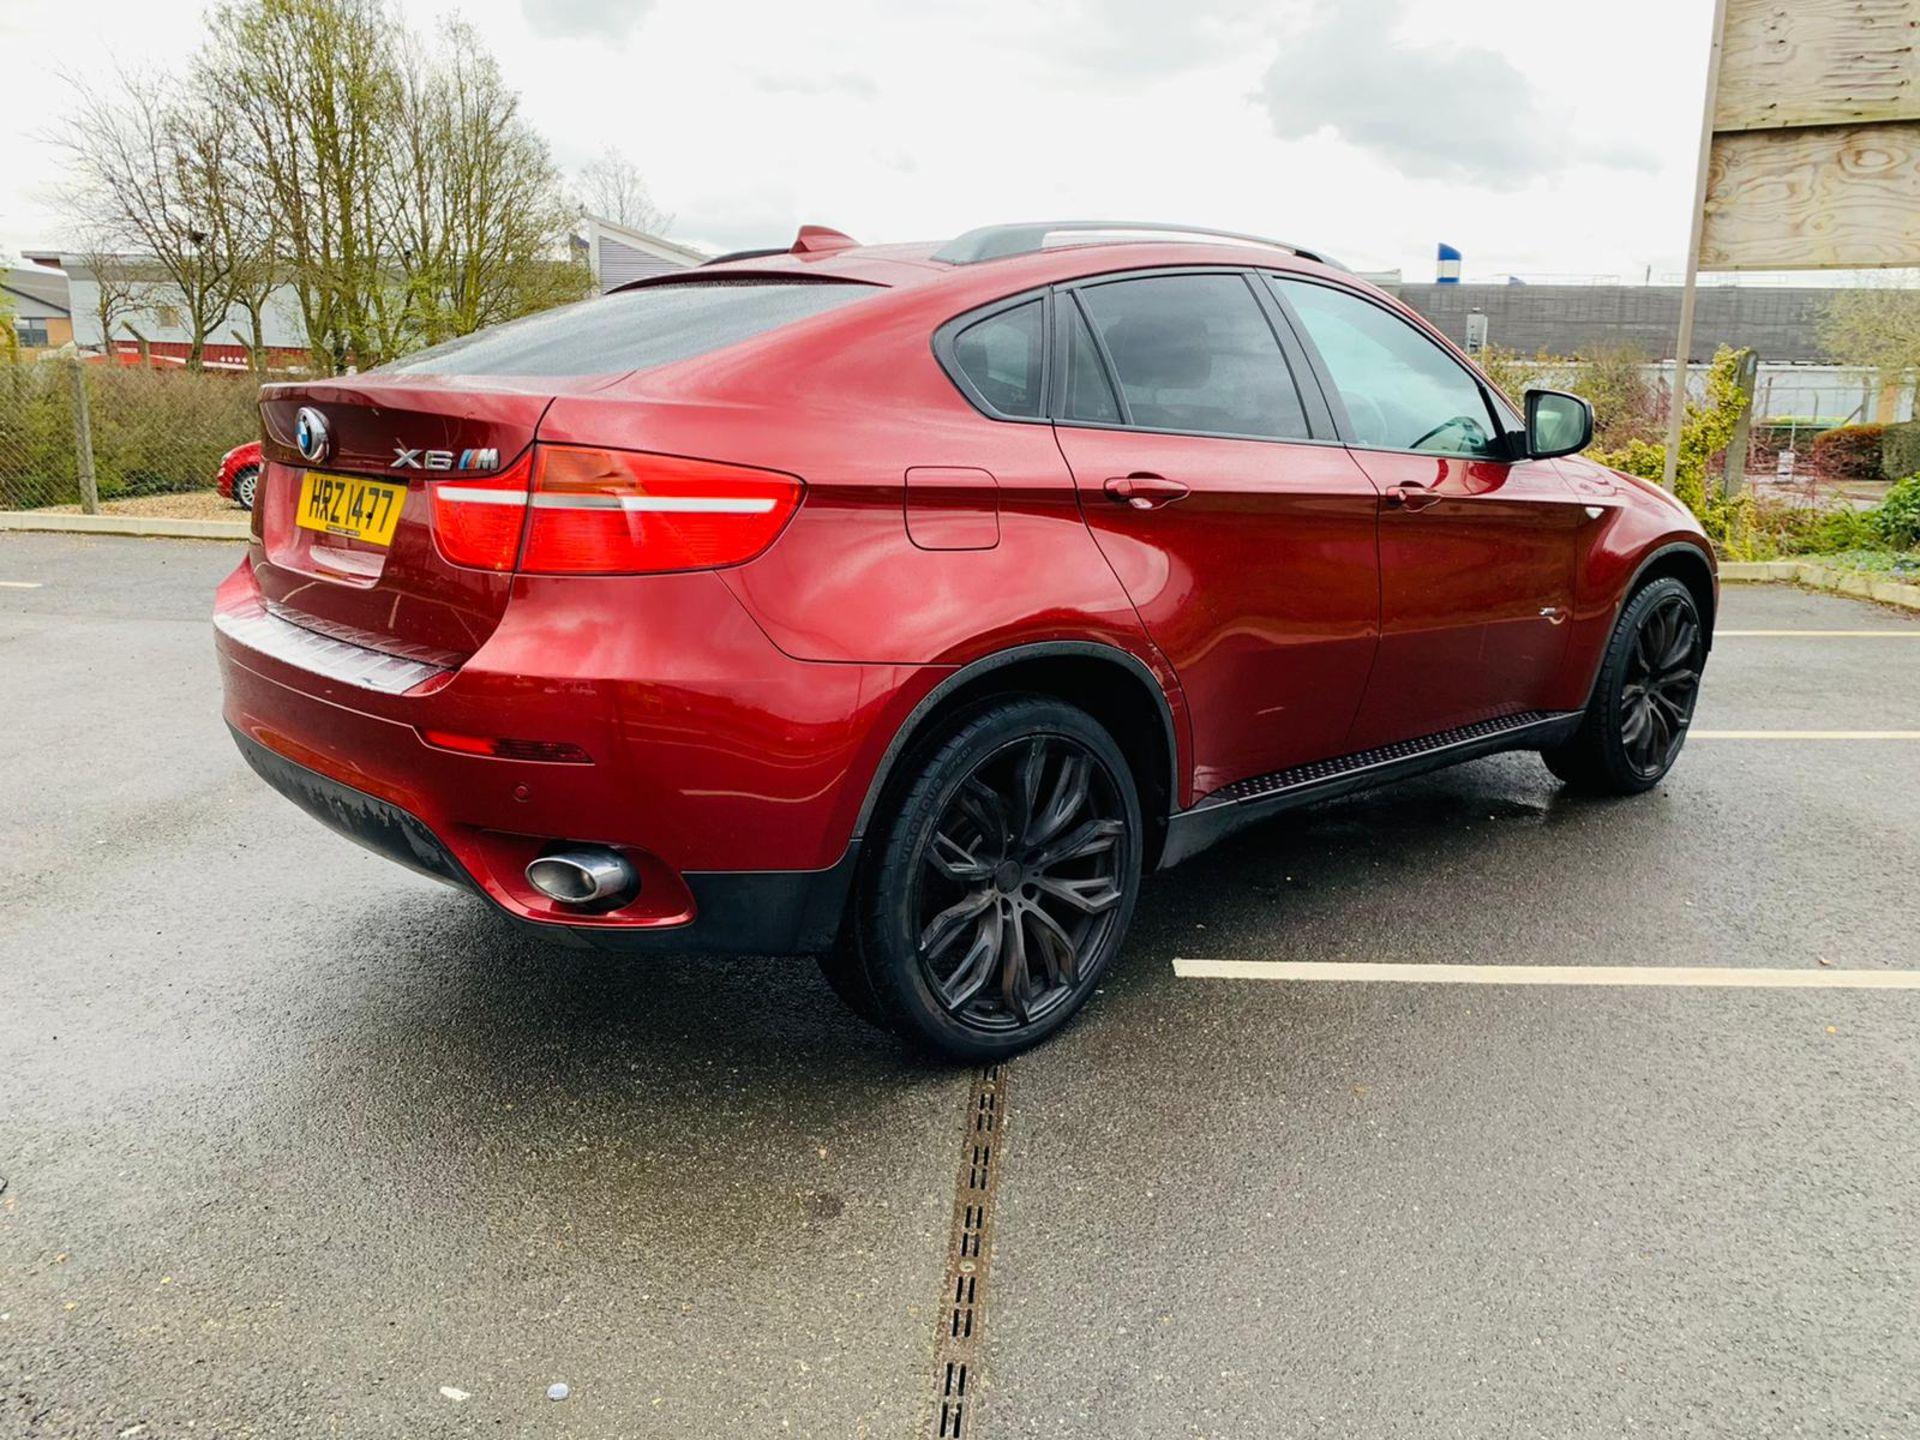 Reseve Met - BMW X6 xDrive 3.0d Auto - 2014 Reg - Leather Interior -Parking Sensors - Reversing Cam - Image 10 of 30